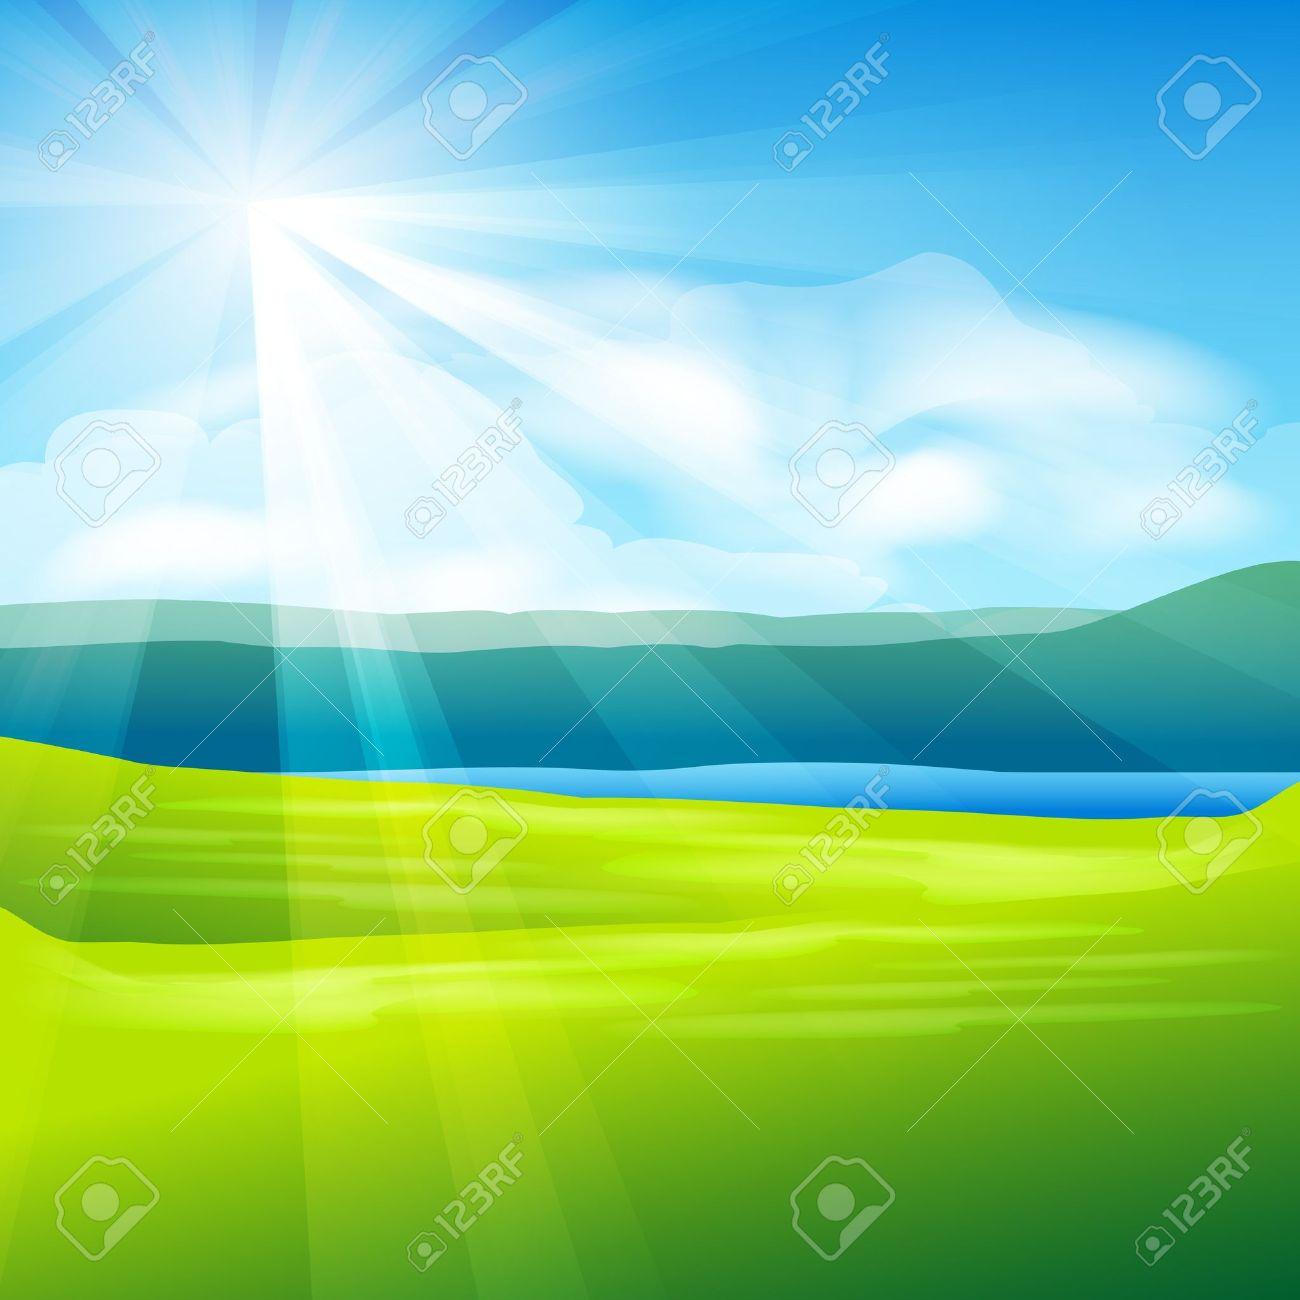 abstract summer landscape background - vector illustration Stock Vector - 12201911